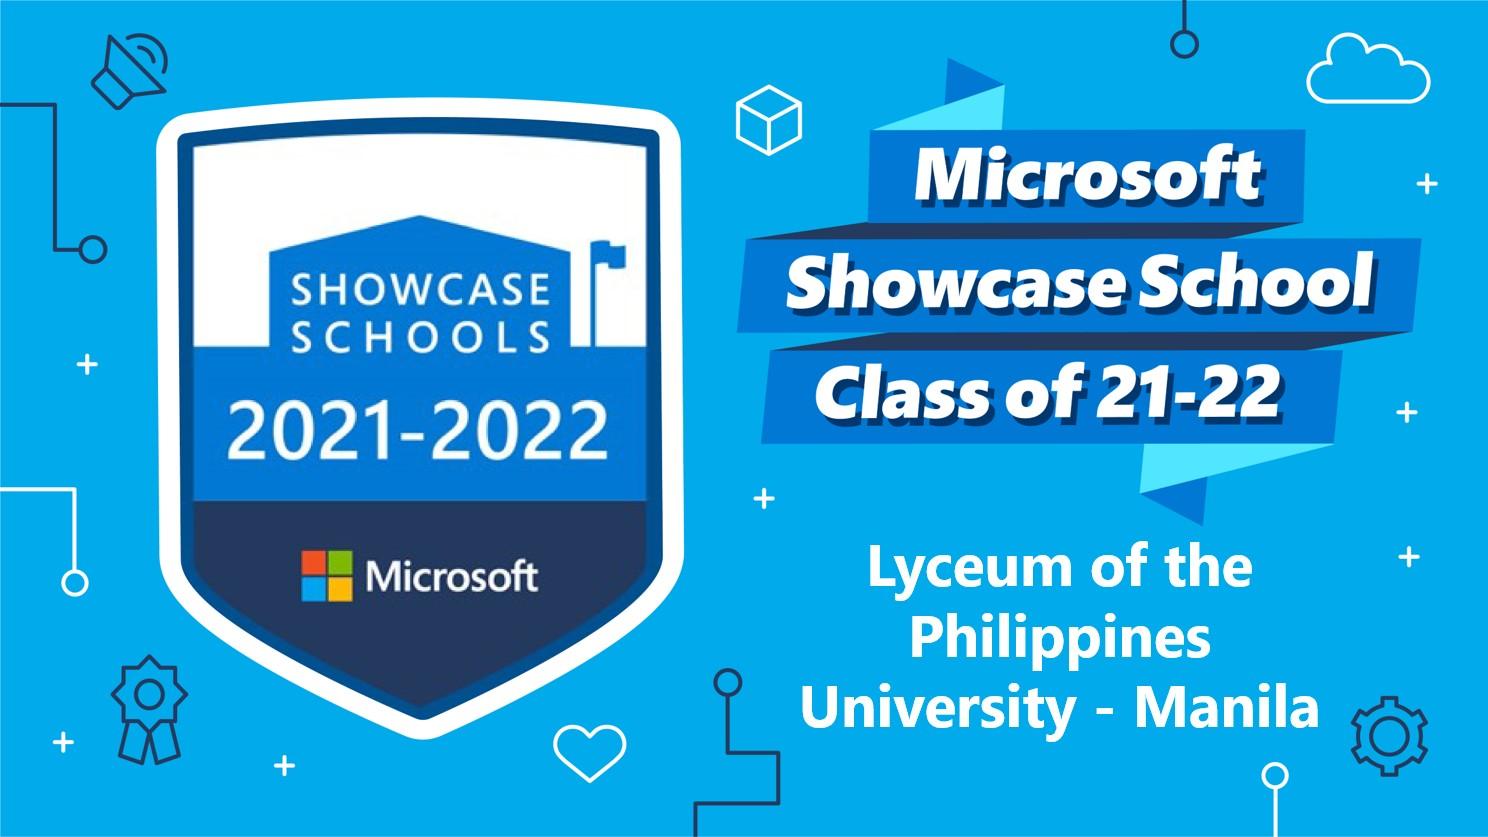 LPU is a Microsoft Showcase School for 6 Consecutive Years